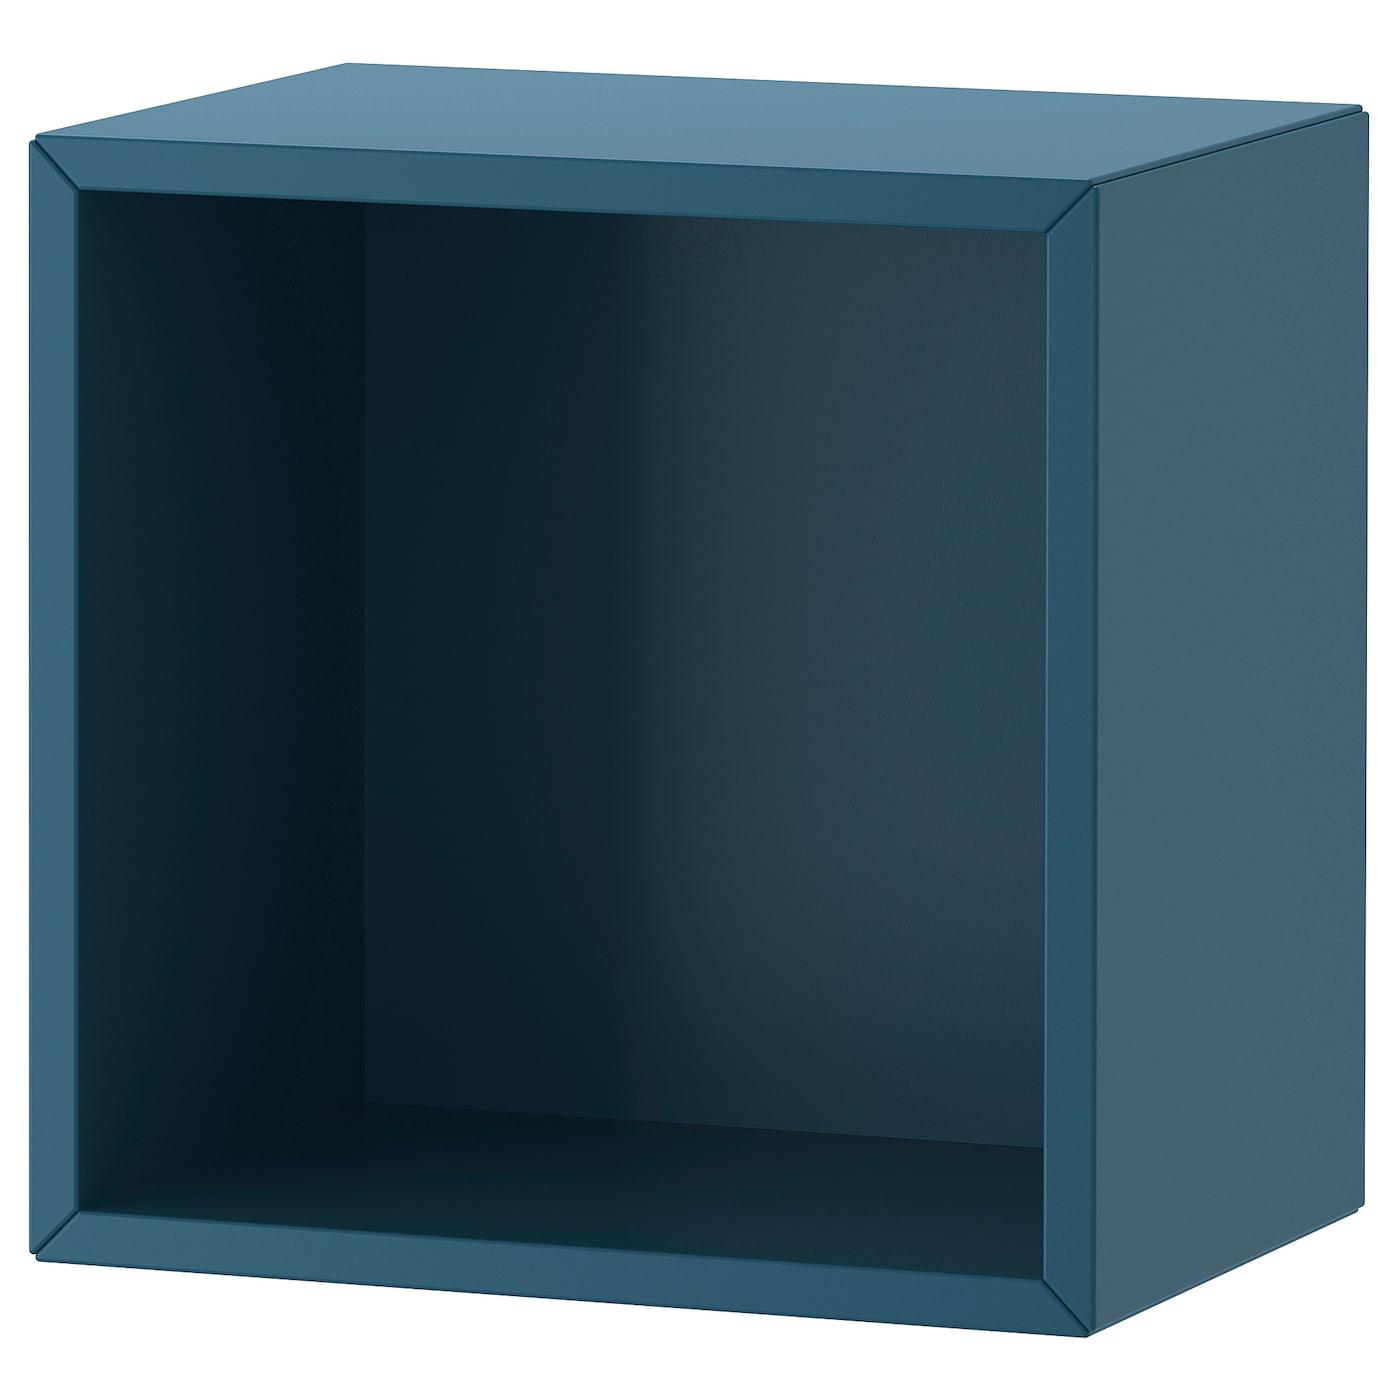 eket cabinet dark blue 35 x 25 x 35 cm ikea. Black Bedroom Furniture Sets. Home Design Ideas